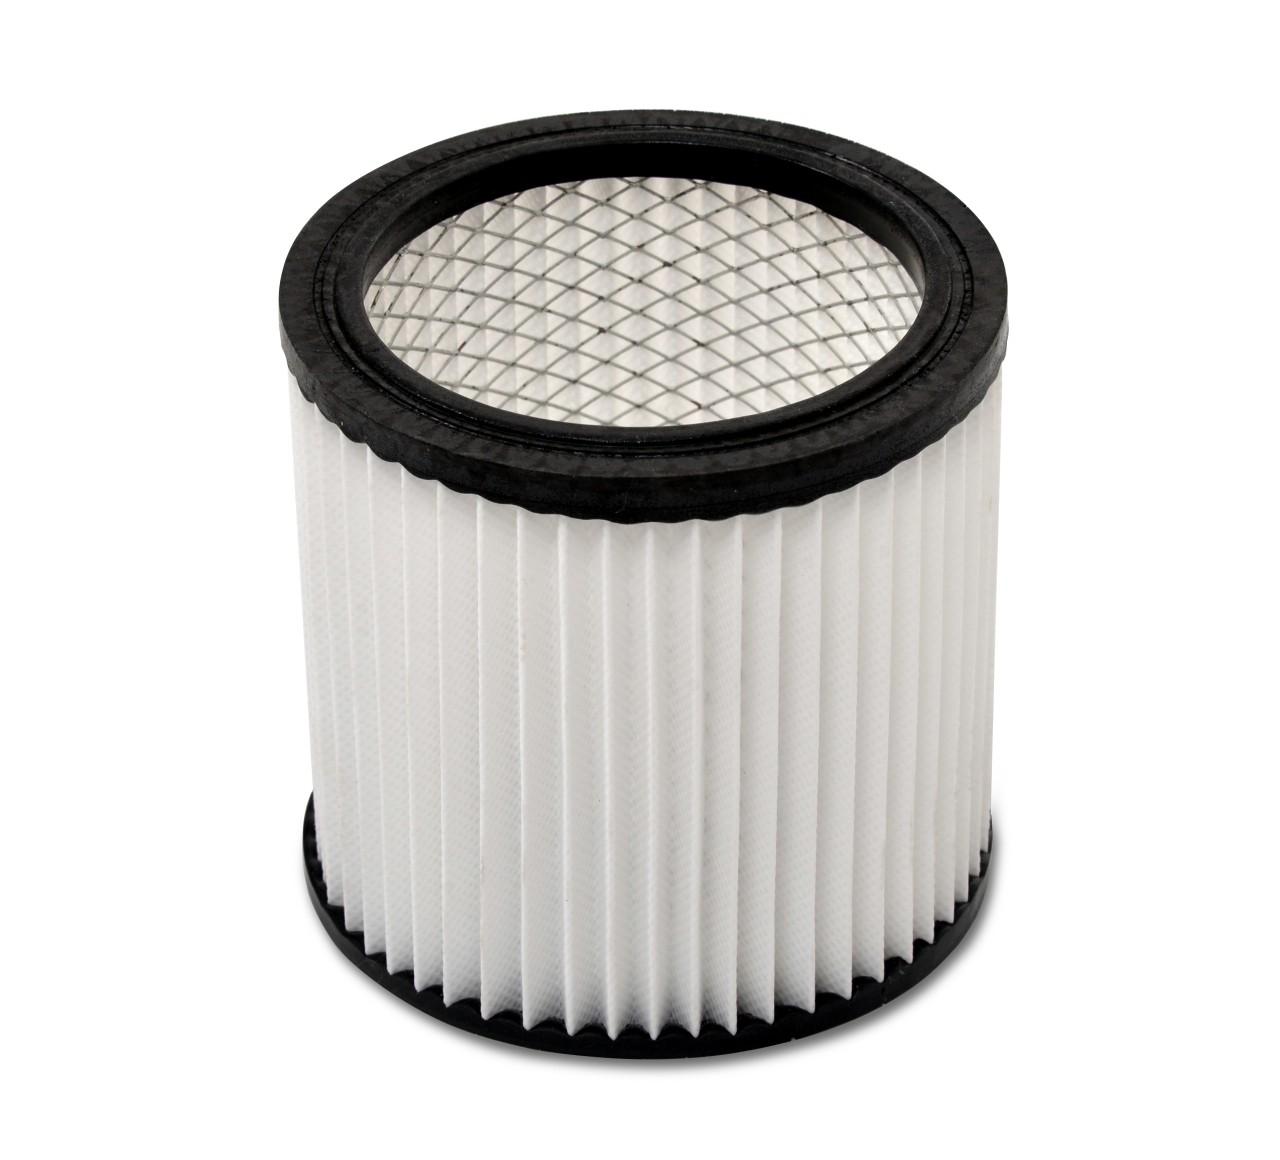 EDF 1010 - náhradní papírový filtr